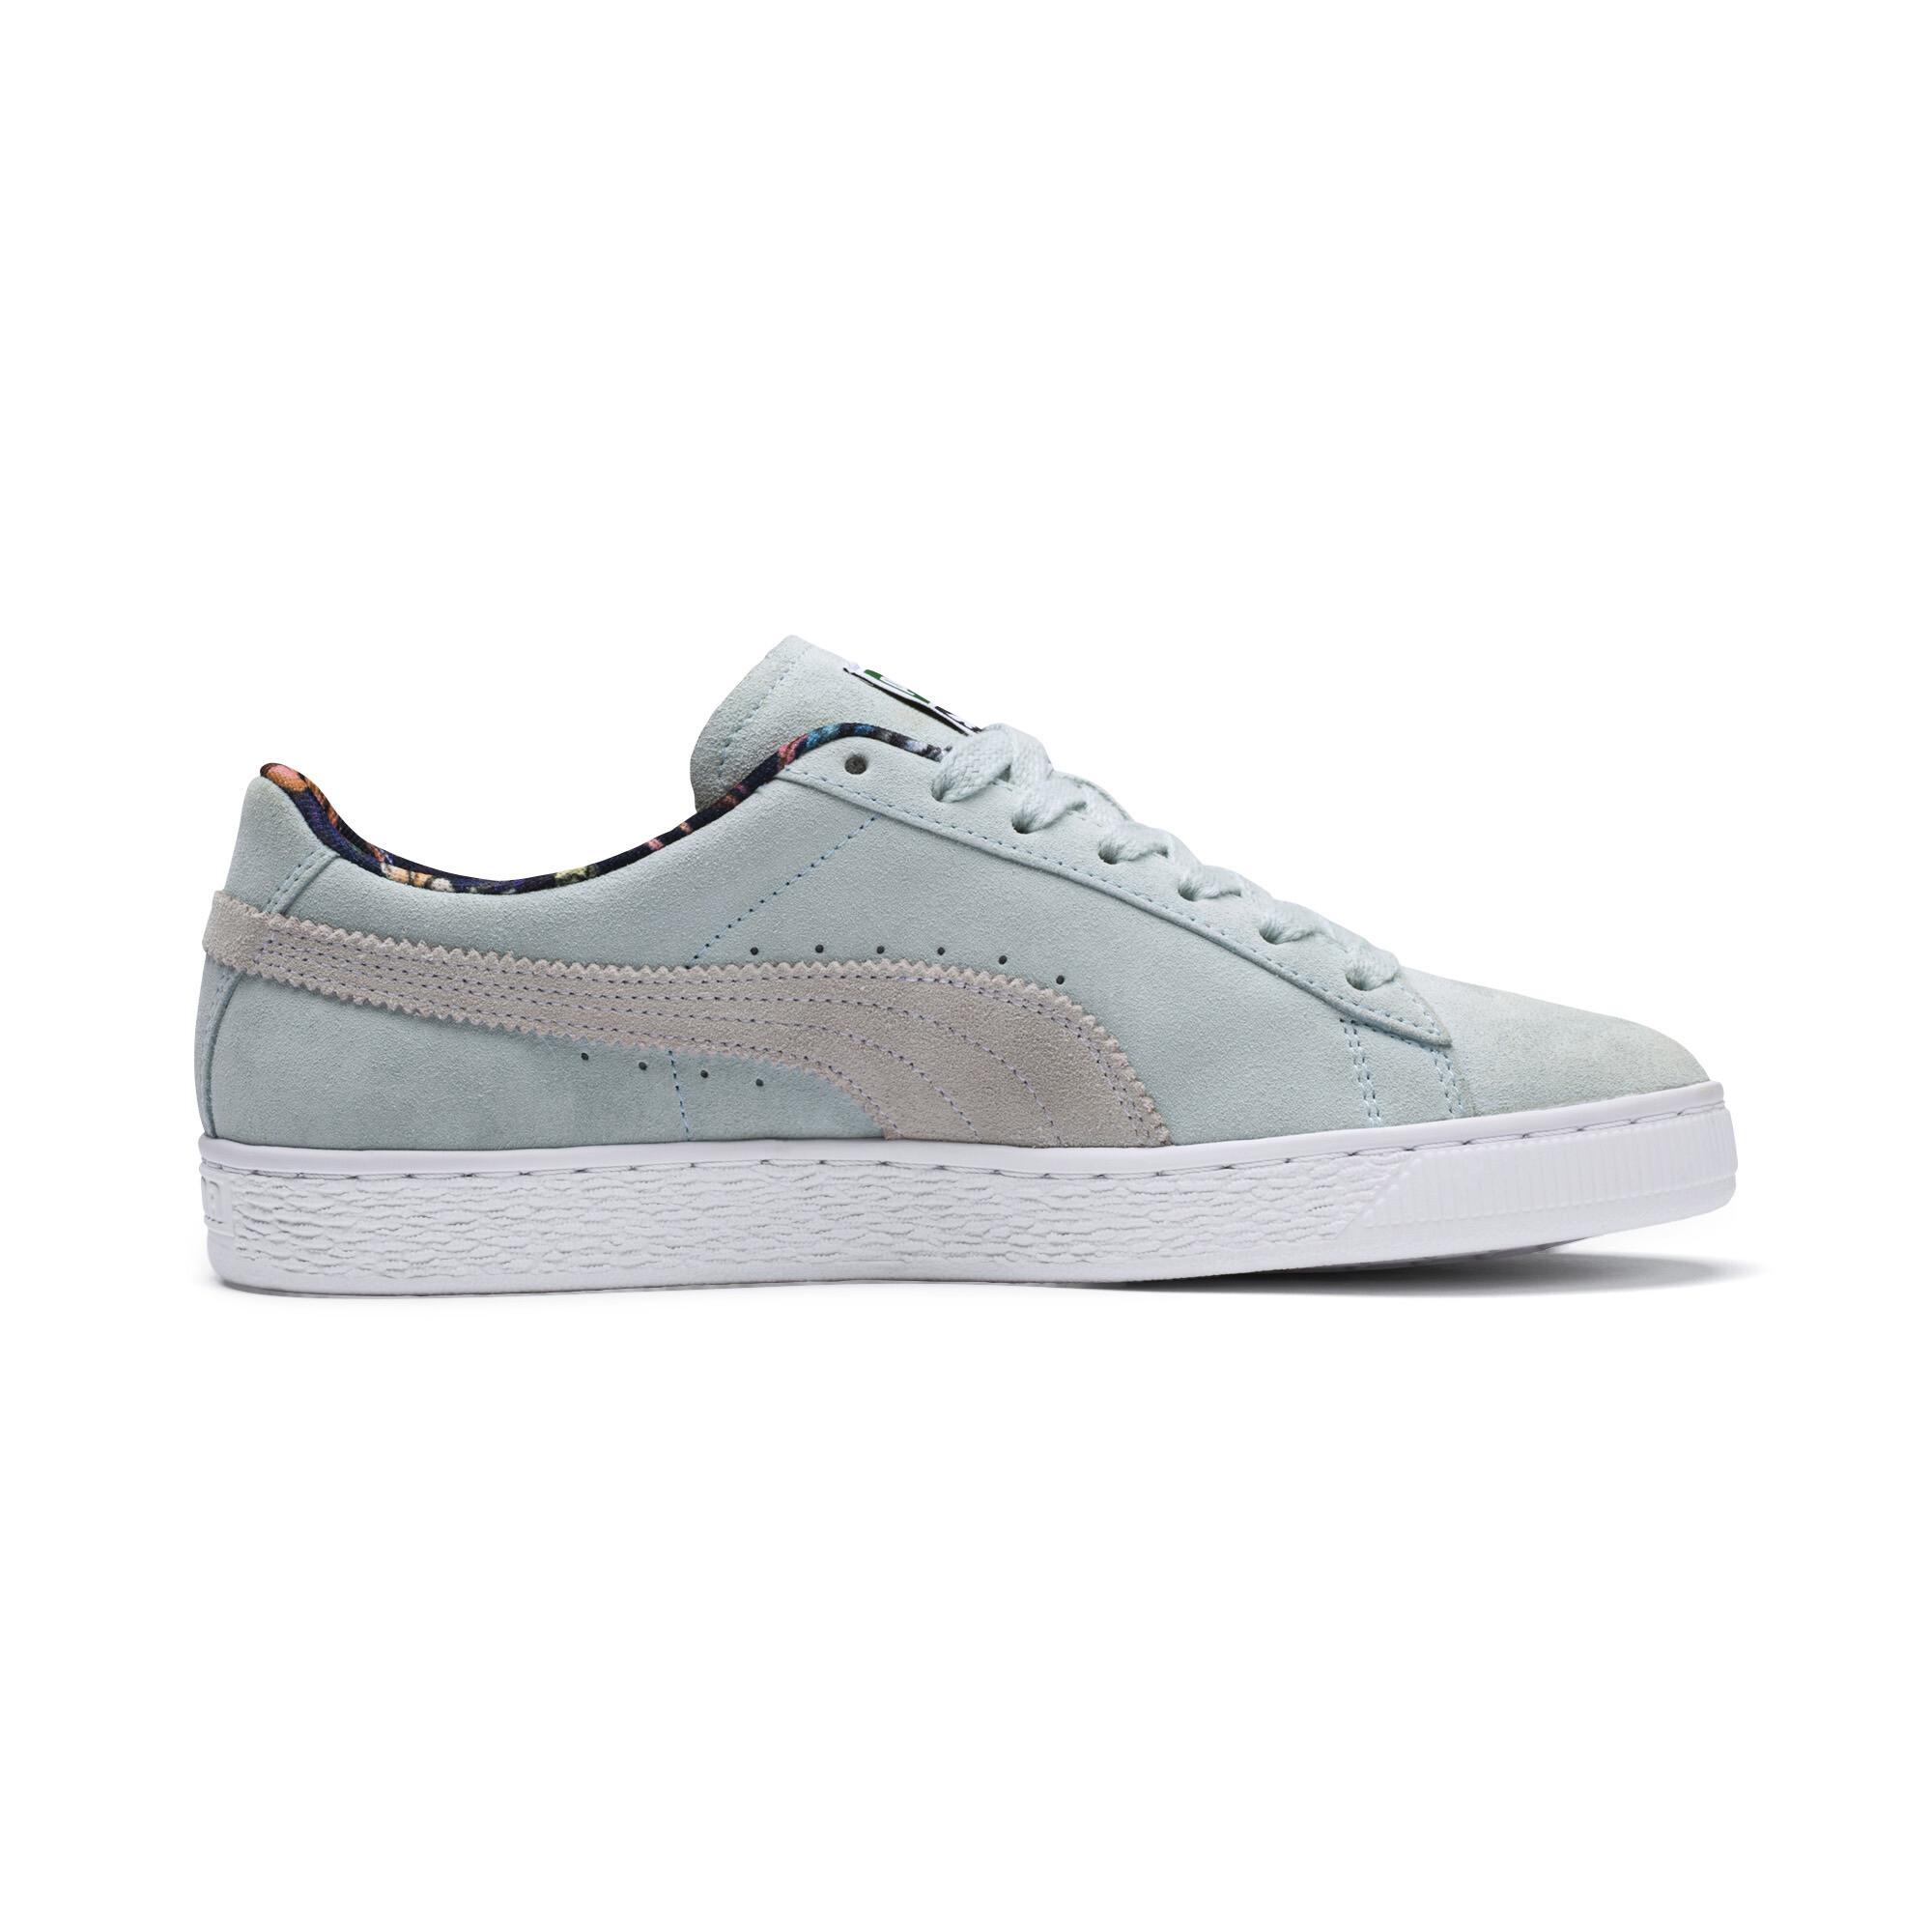 Image Puma Suede Secret Garden Sneakers #6